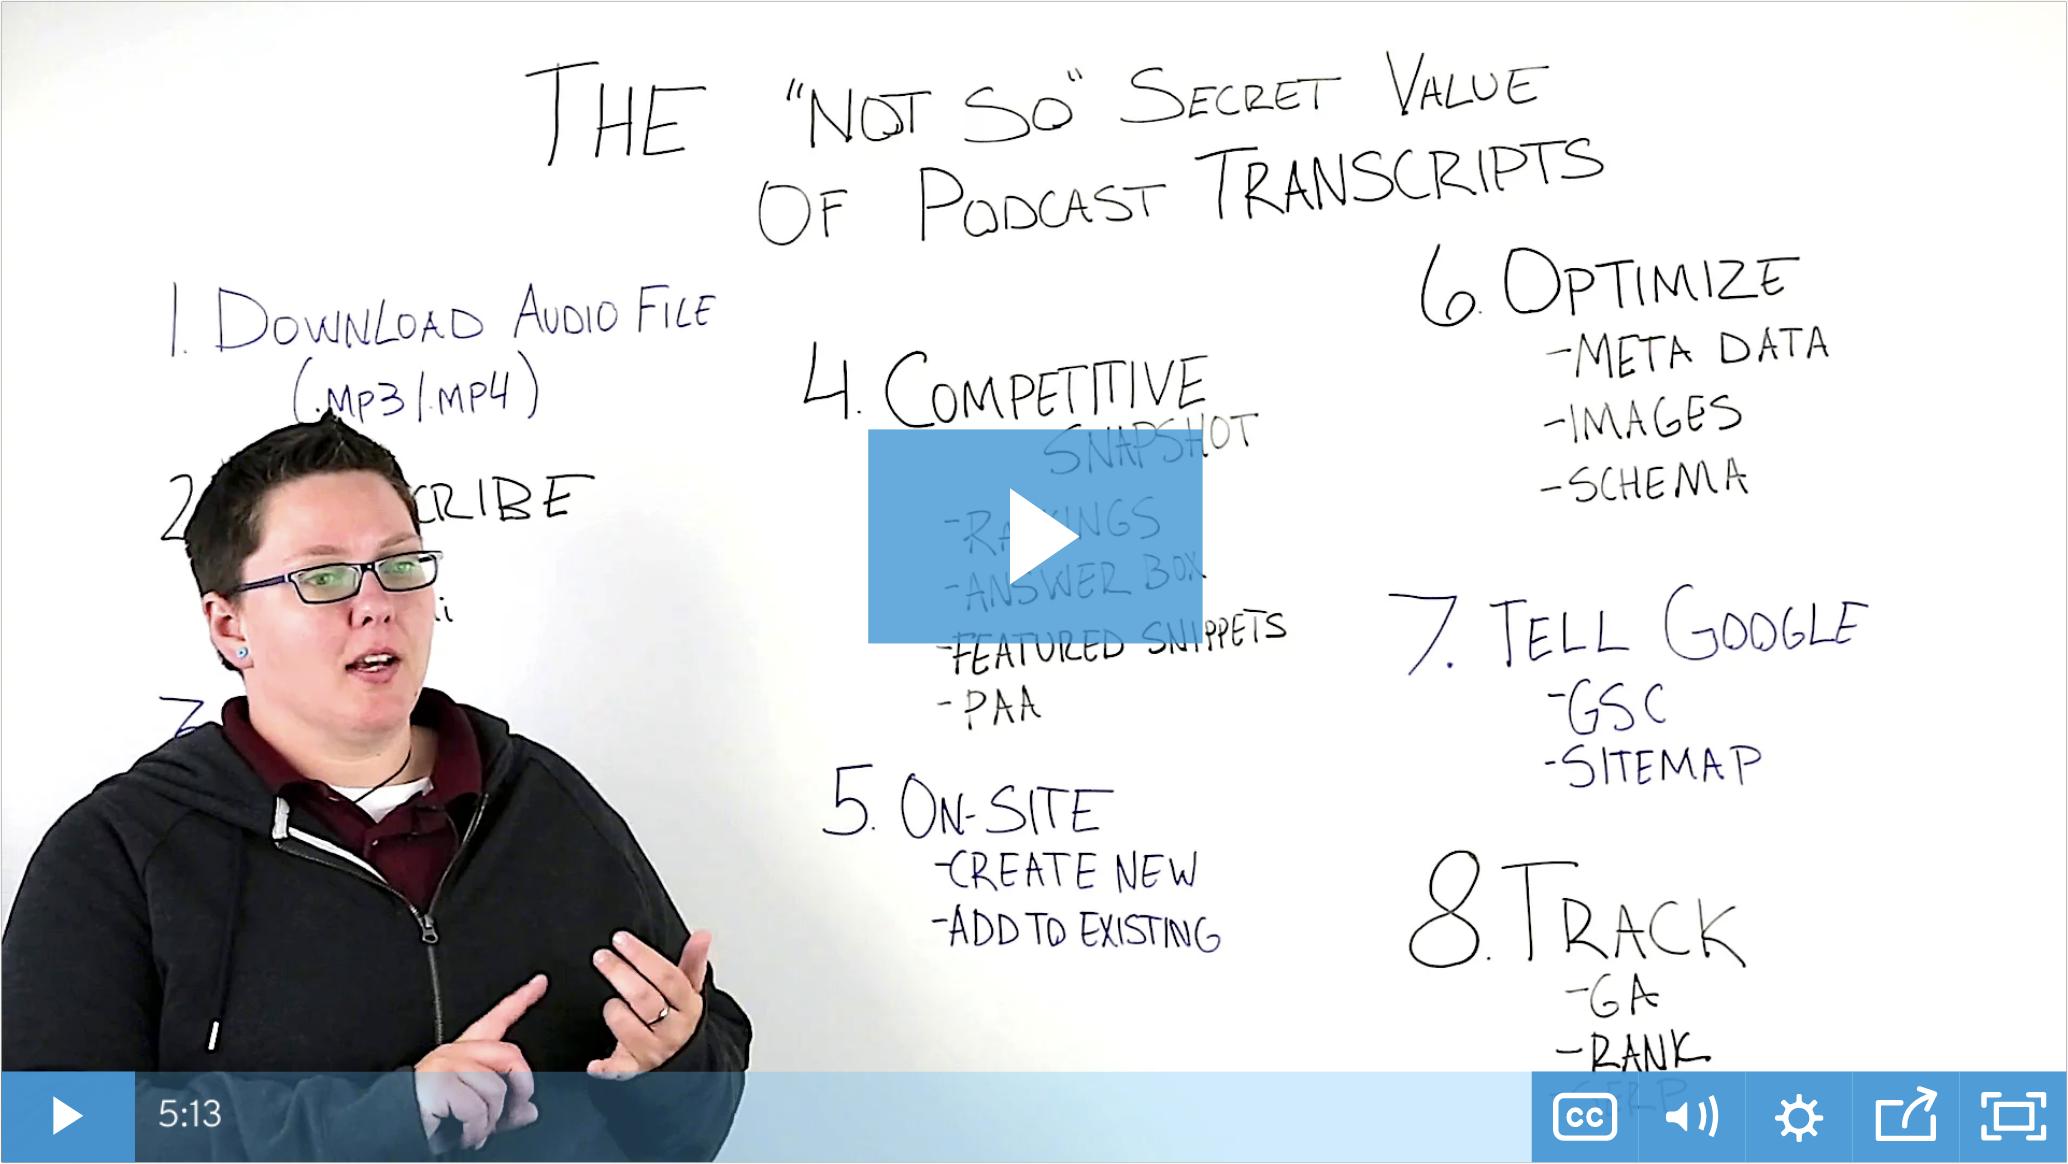 The NotSoSecret Value of Podcast Transcripts